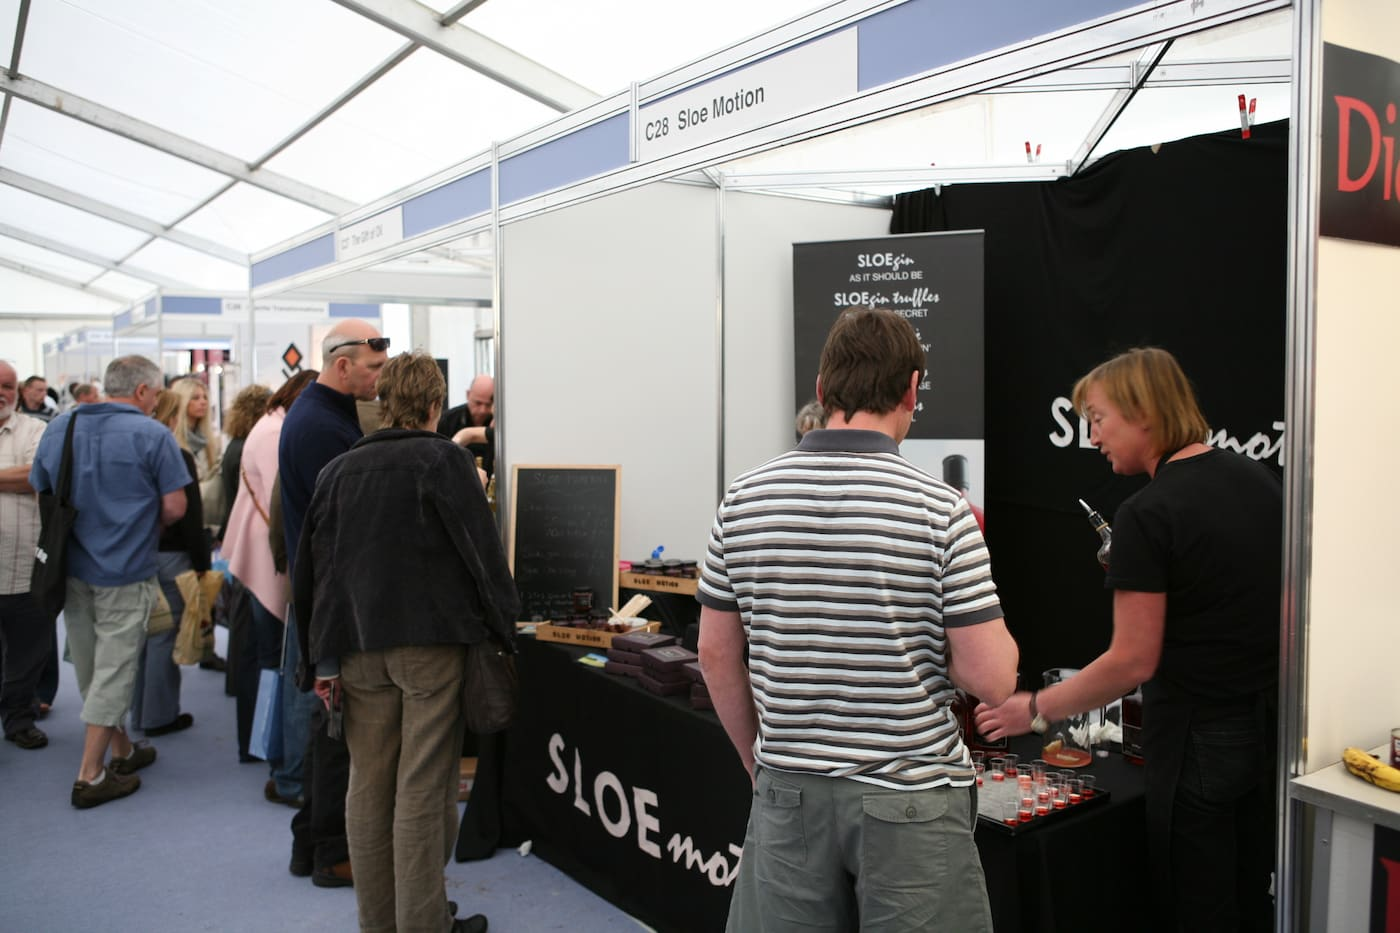 Exhibitions & Trade Shows 2